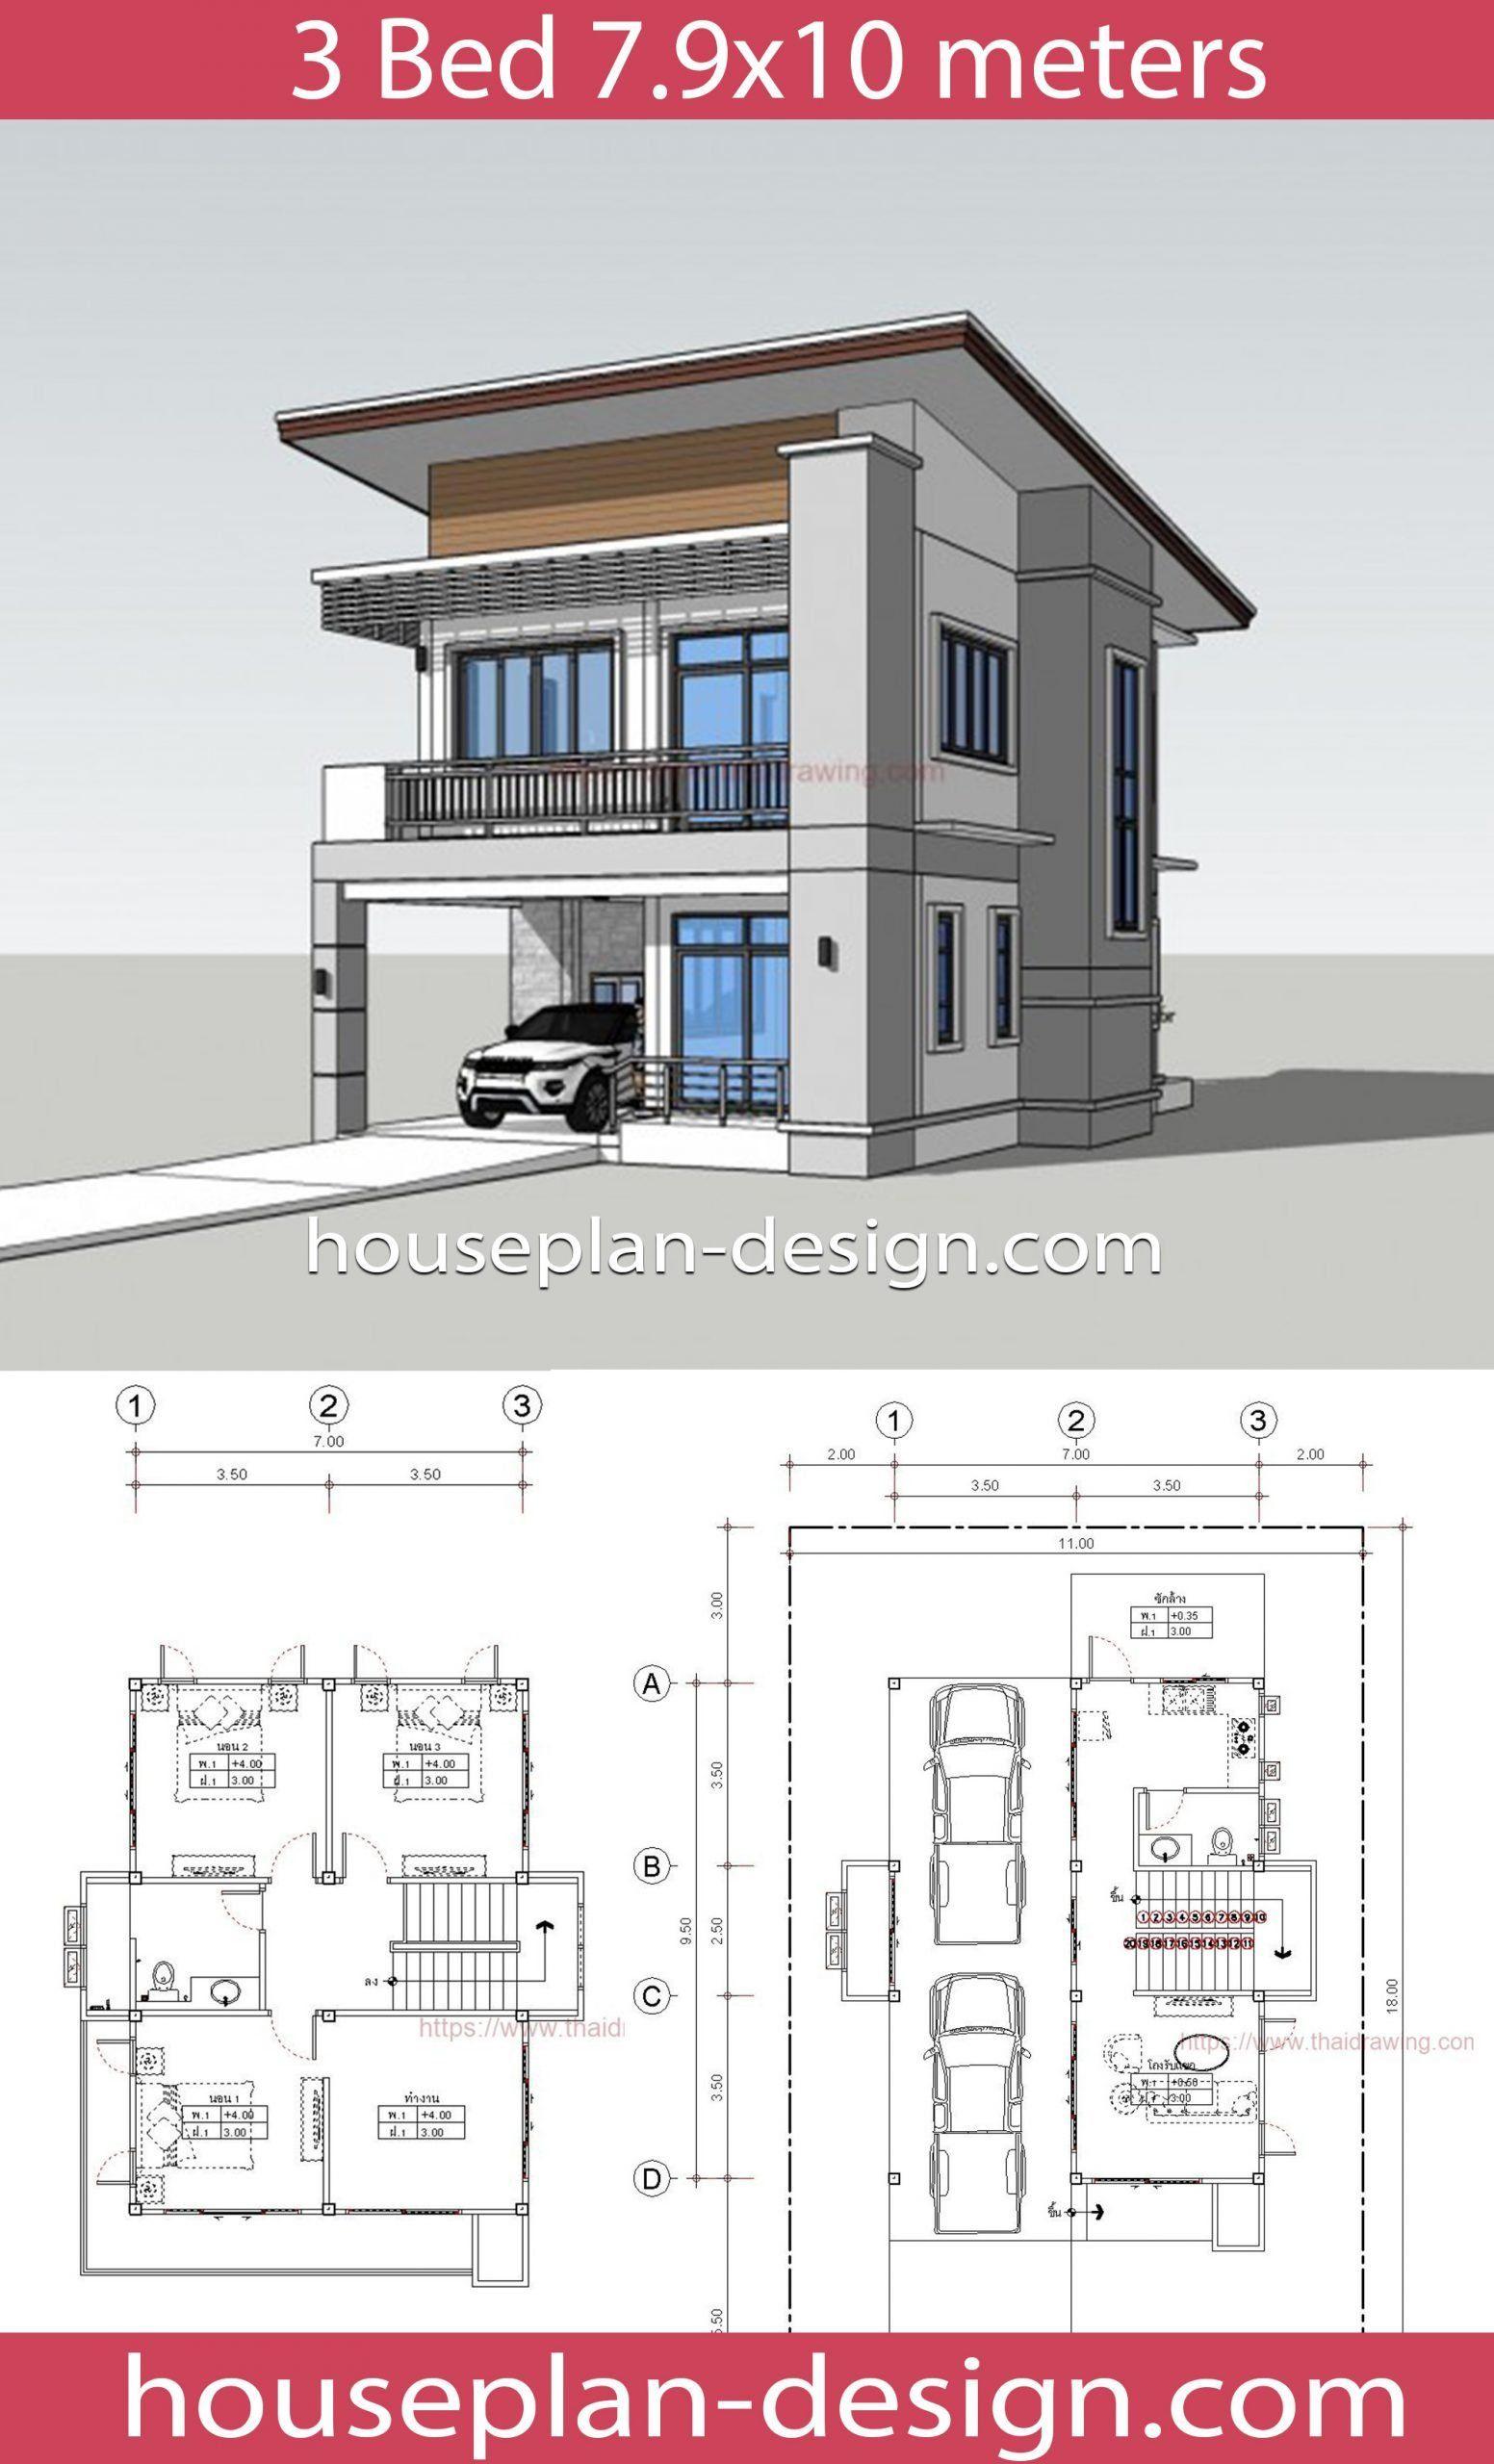 9x10 Bedroom Design Idea Luxury Pujoy Studio House Design Idea 7 9x10 With 3 Bedrooms In 2020 House Design Unique House Plans Duplex House Design